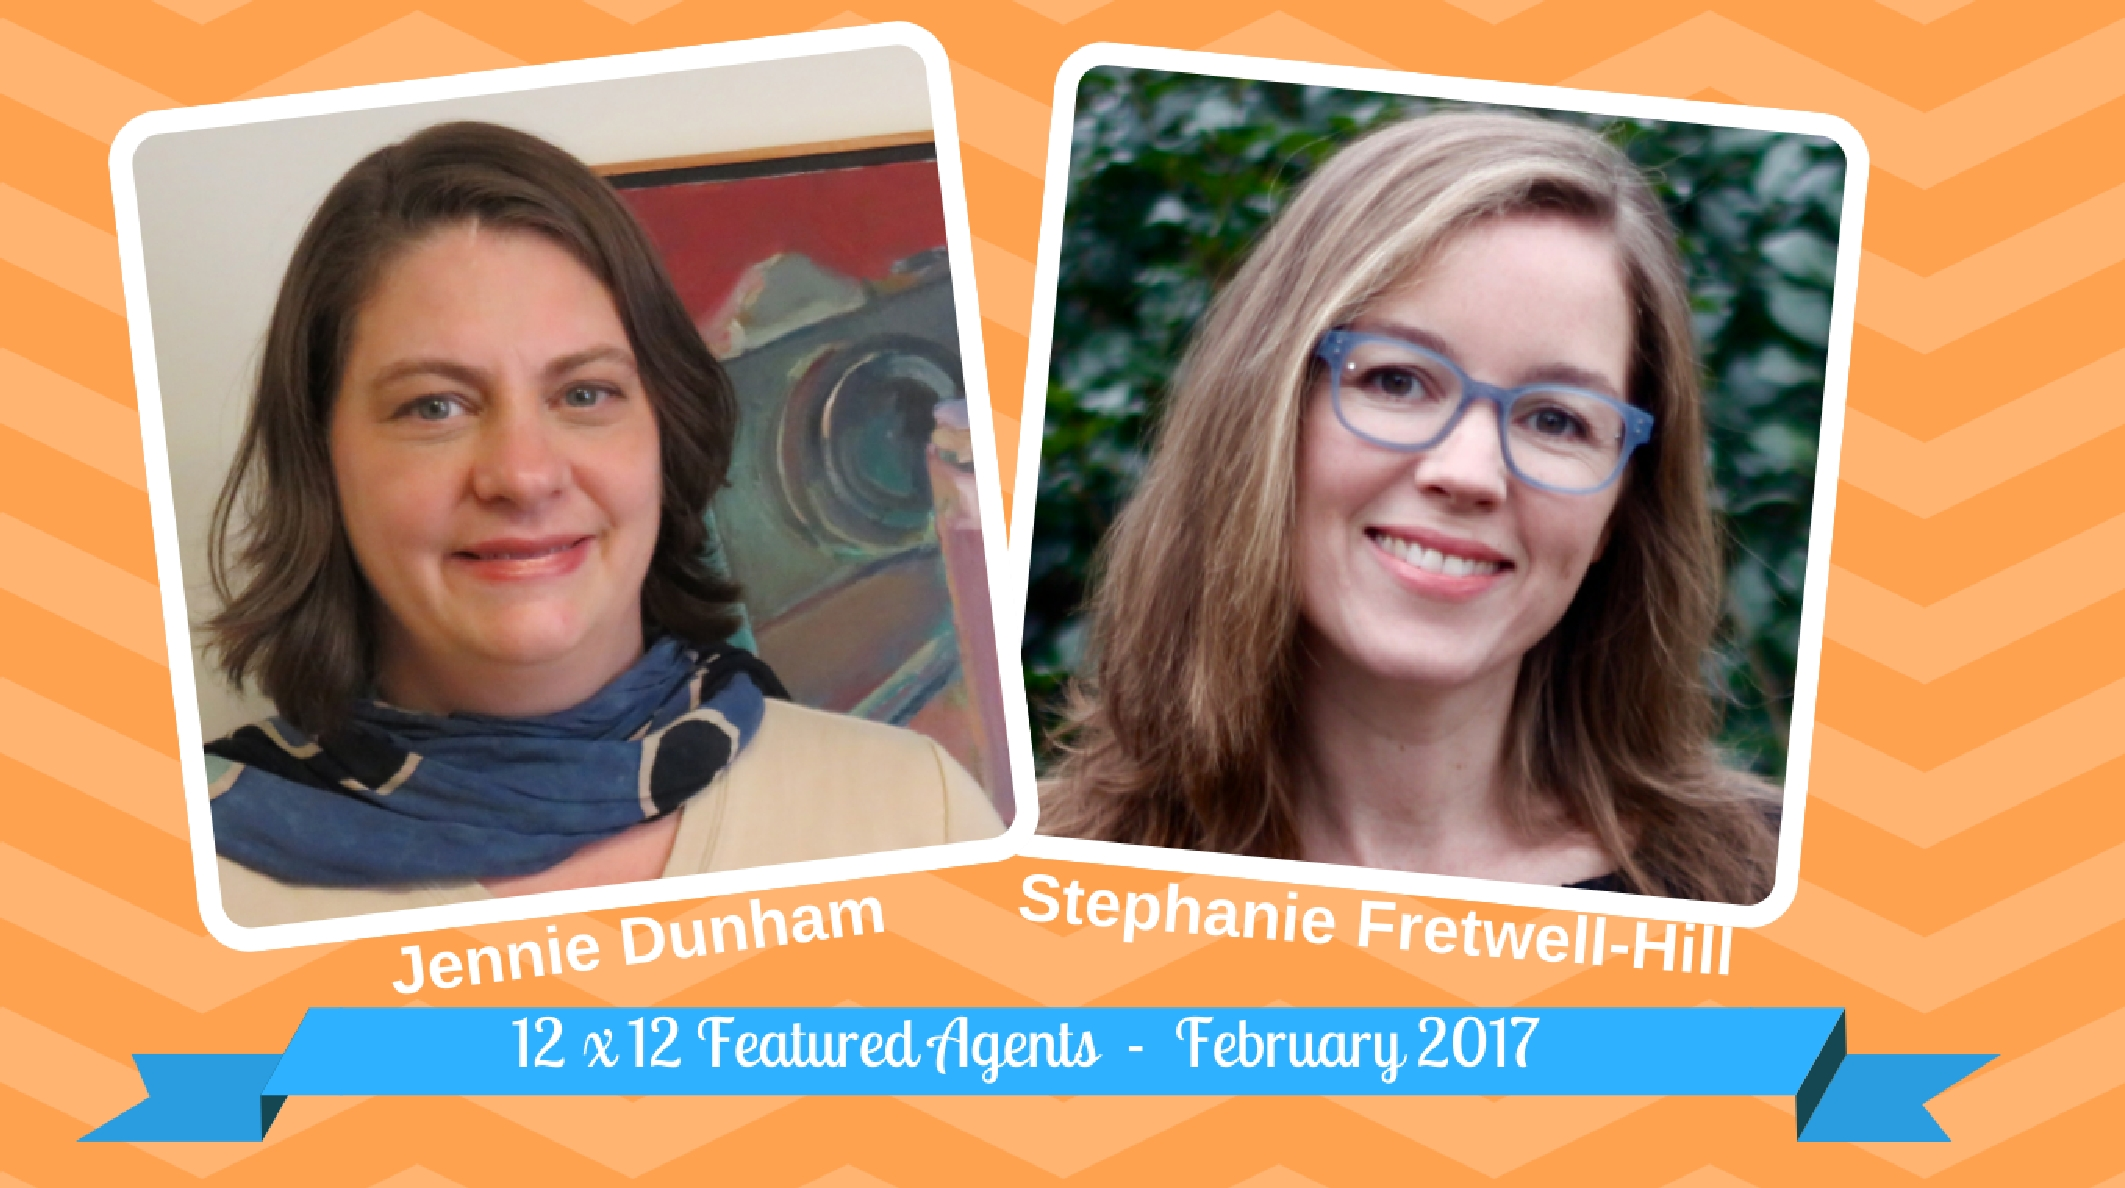 Jennie Dunham & Stephanie Fretwell-Hill – 12 X 12 February 2017 Featured Agents